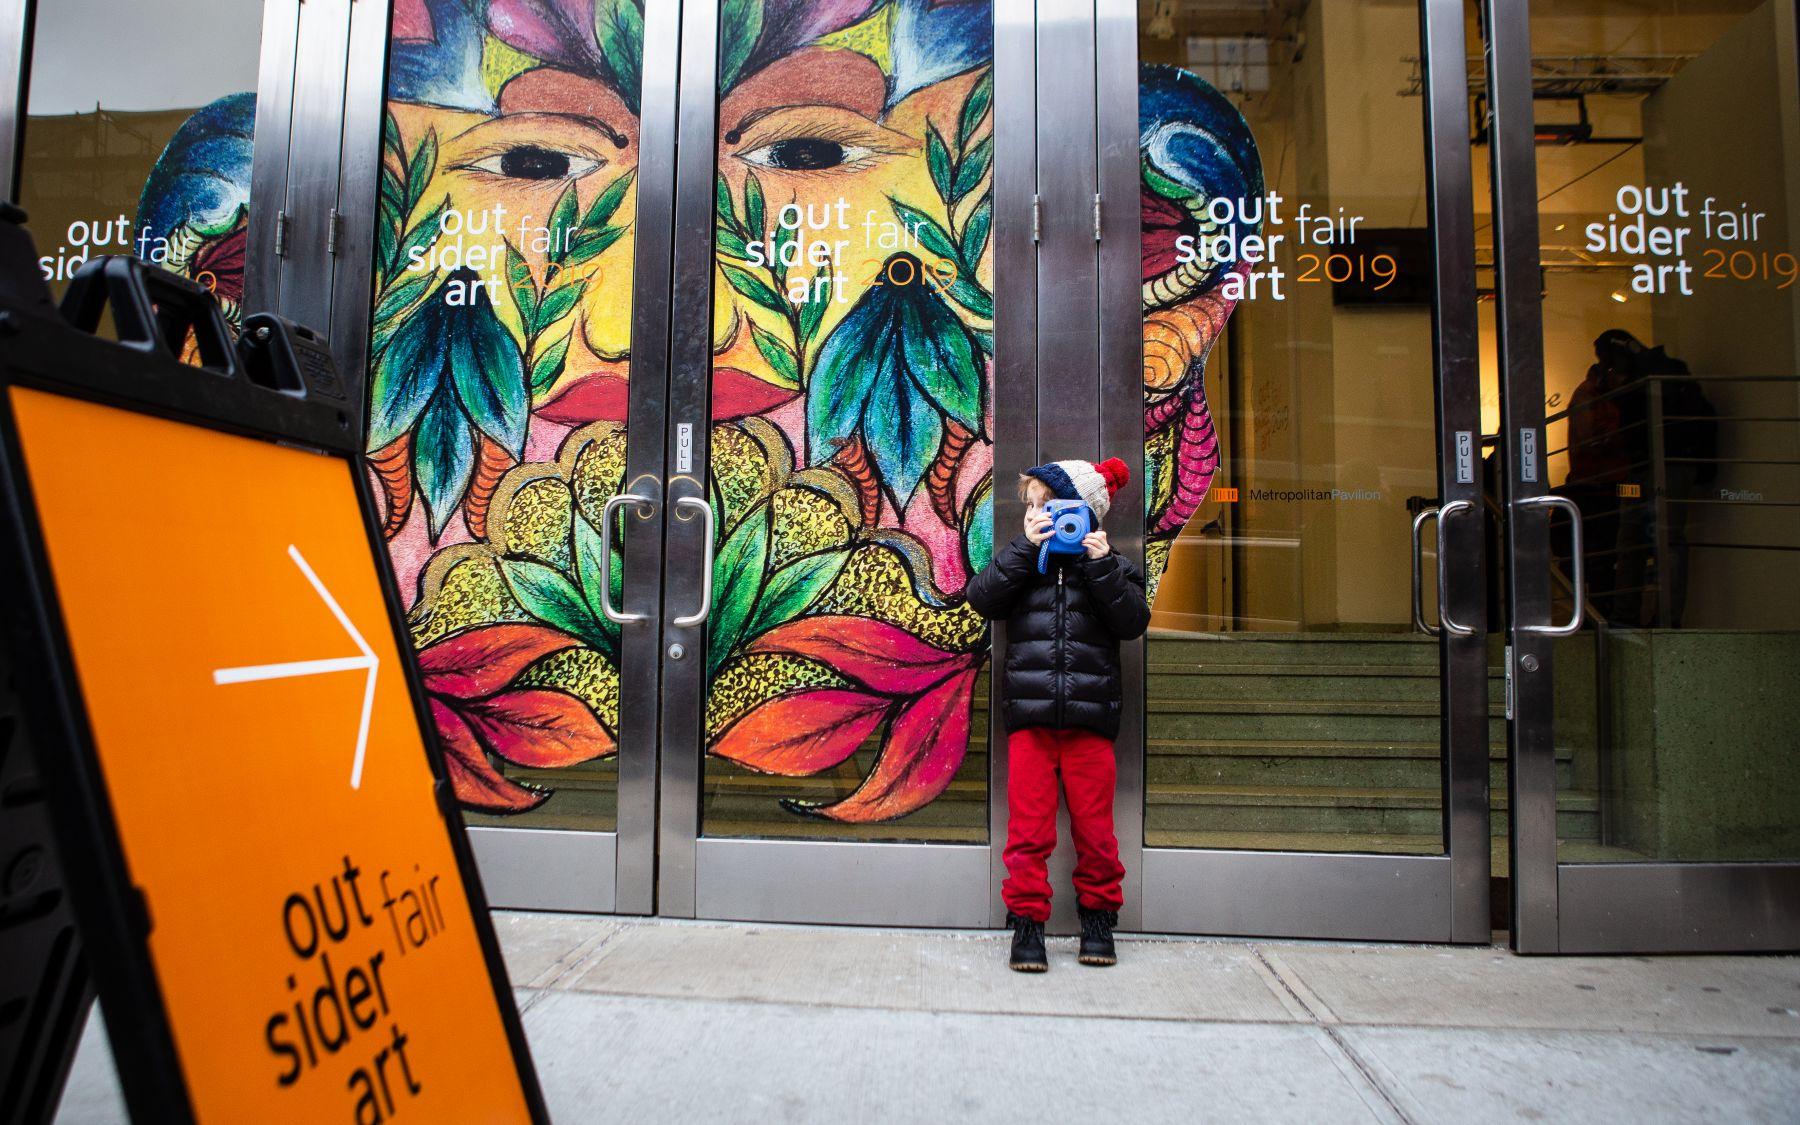 Art Fair Guide - outsider fair new york city